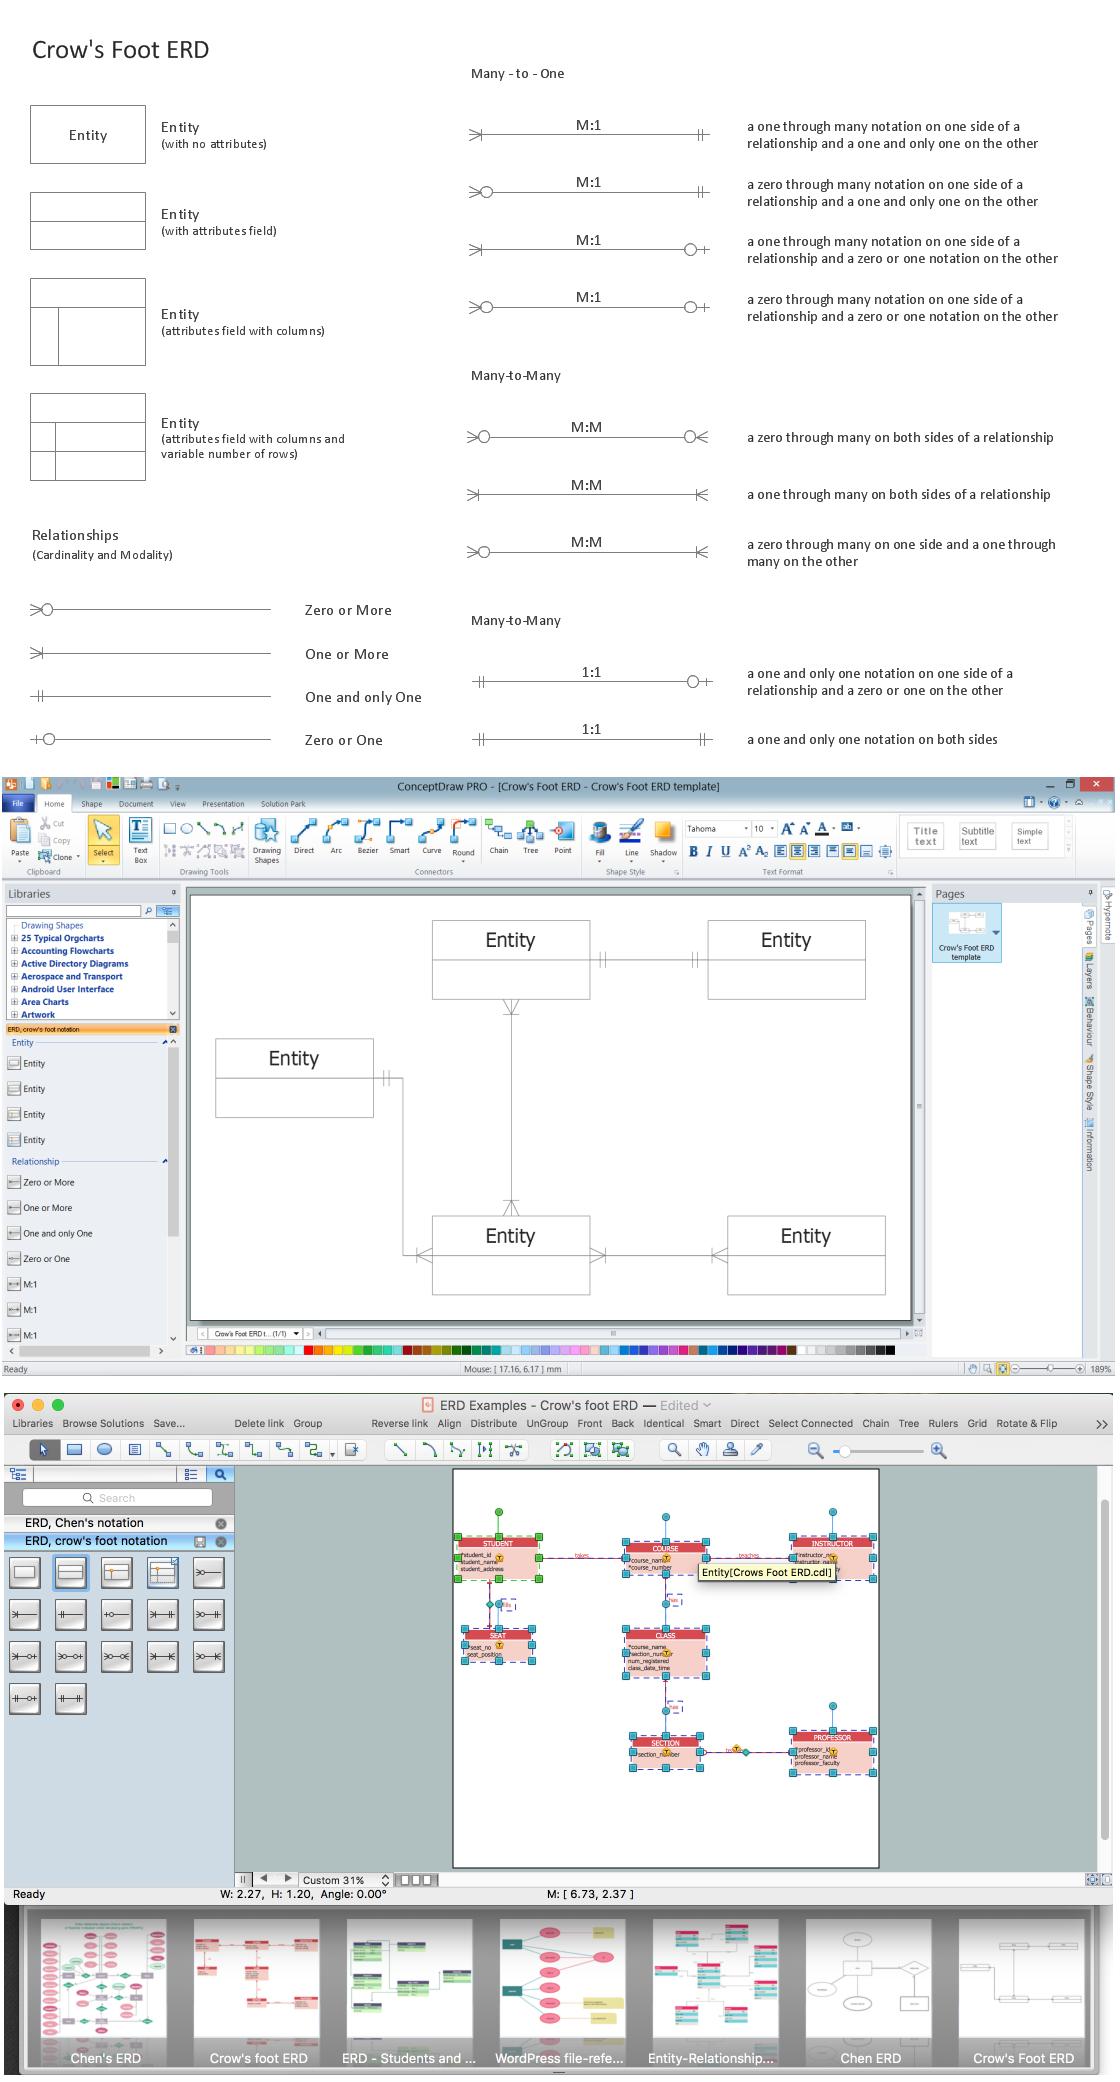 Entity Relationship Diagram - Erd - Software For Design for Entity Relationship Diagram Crows Foot